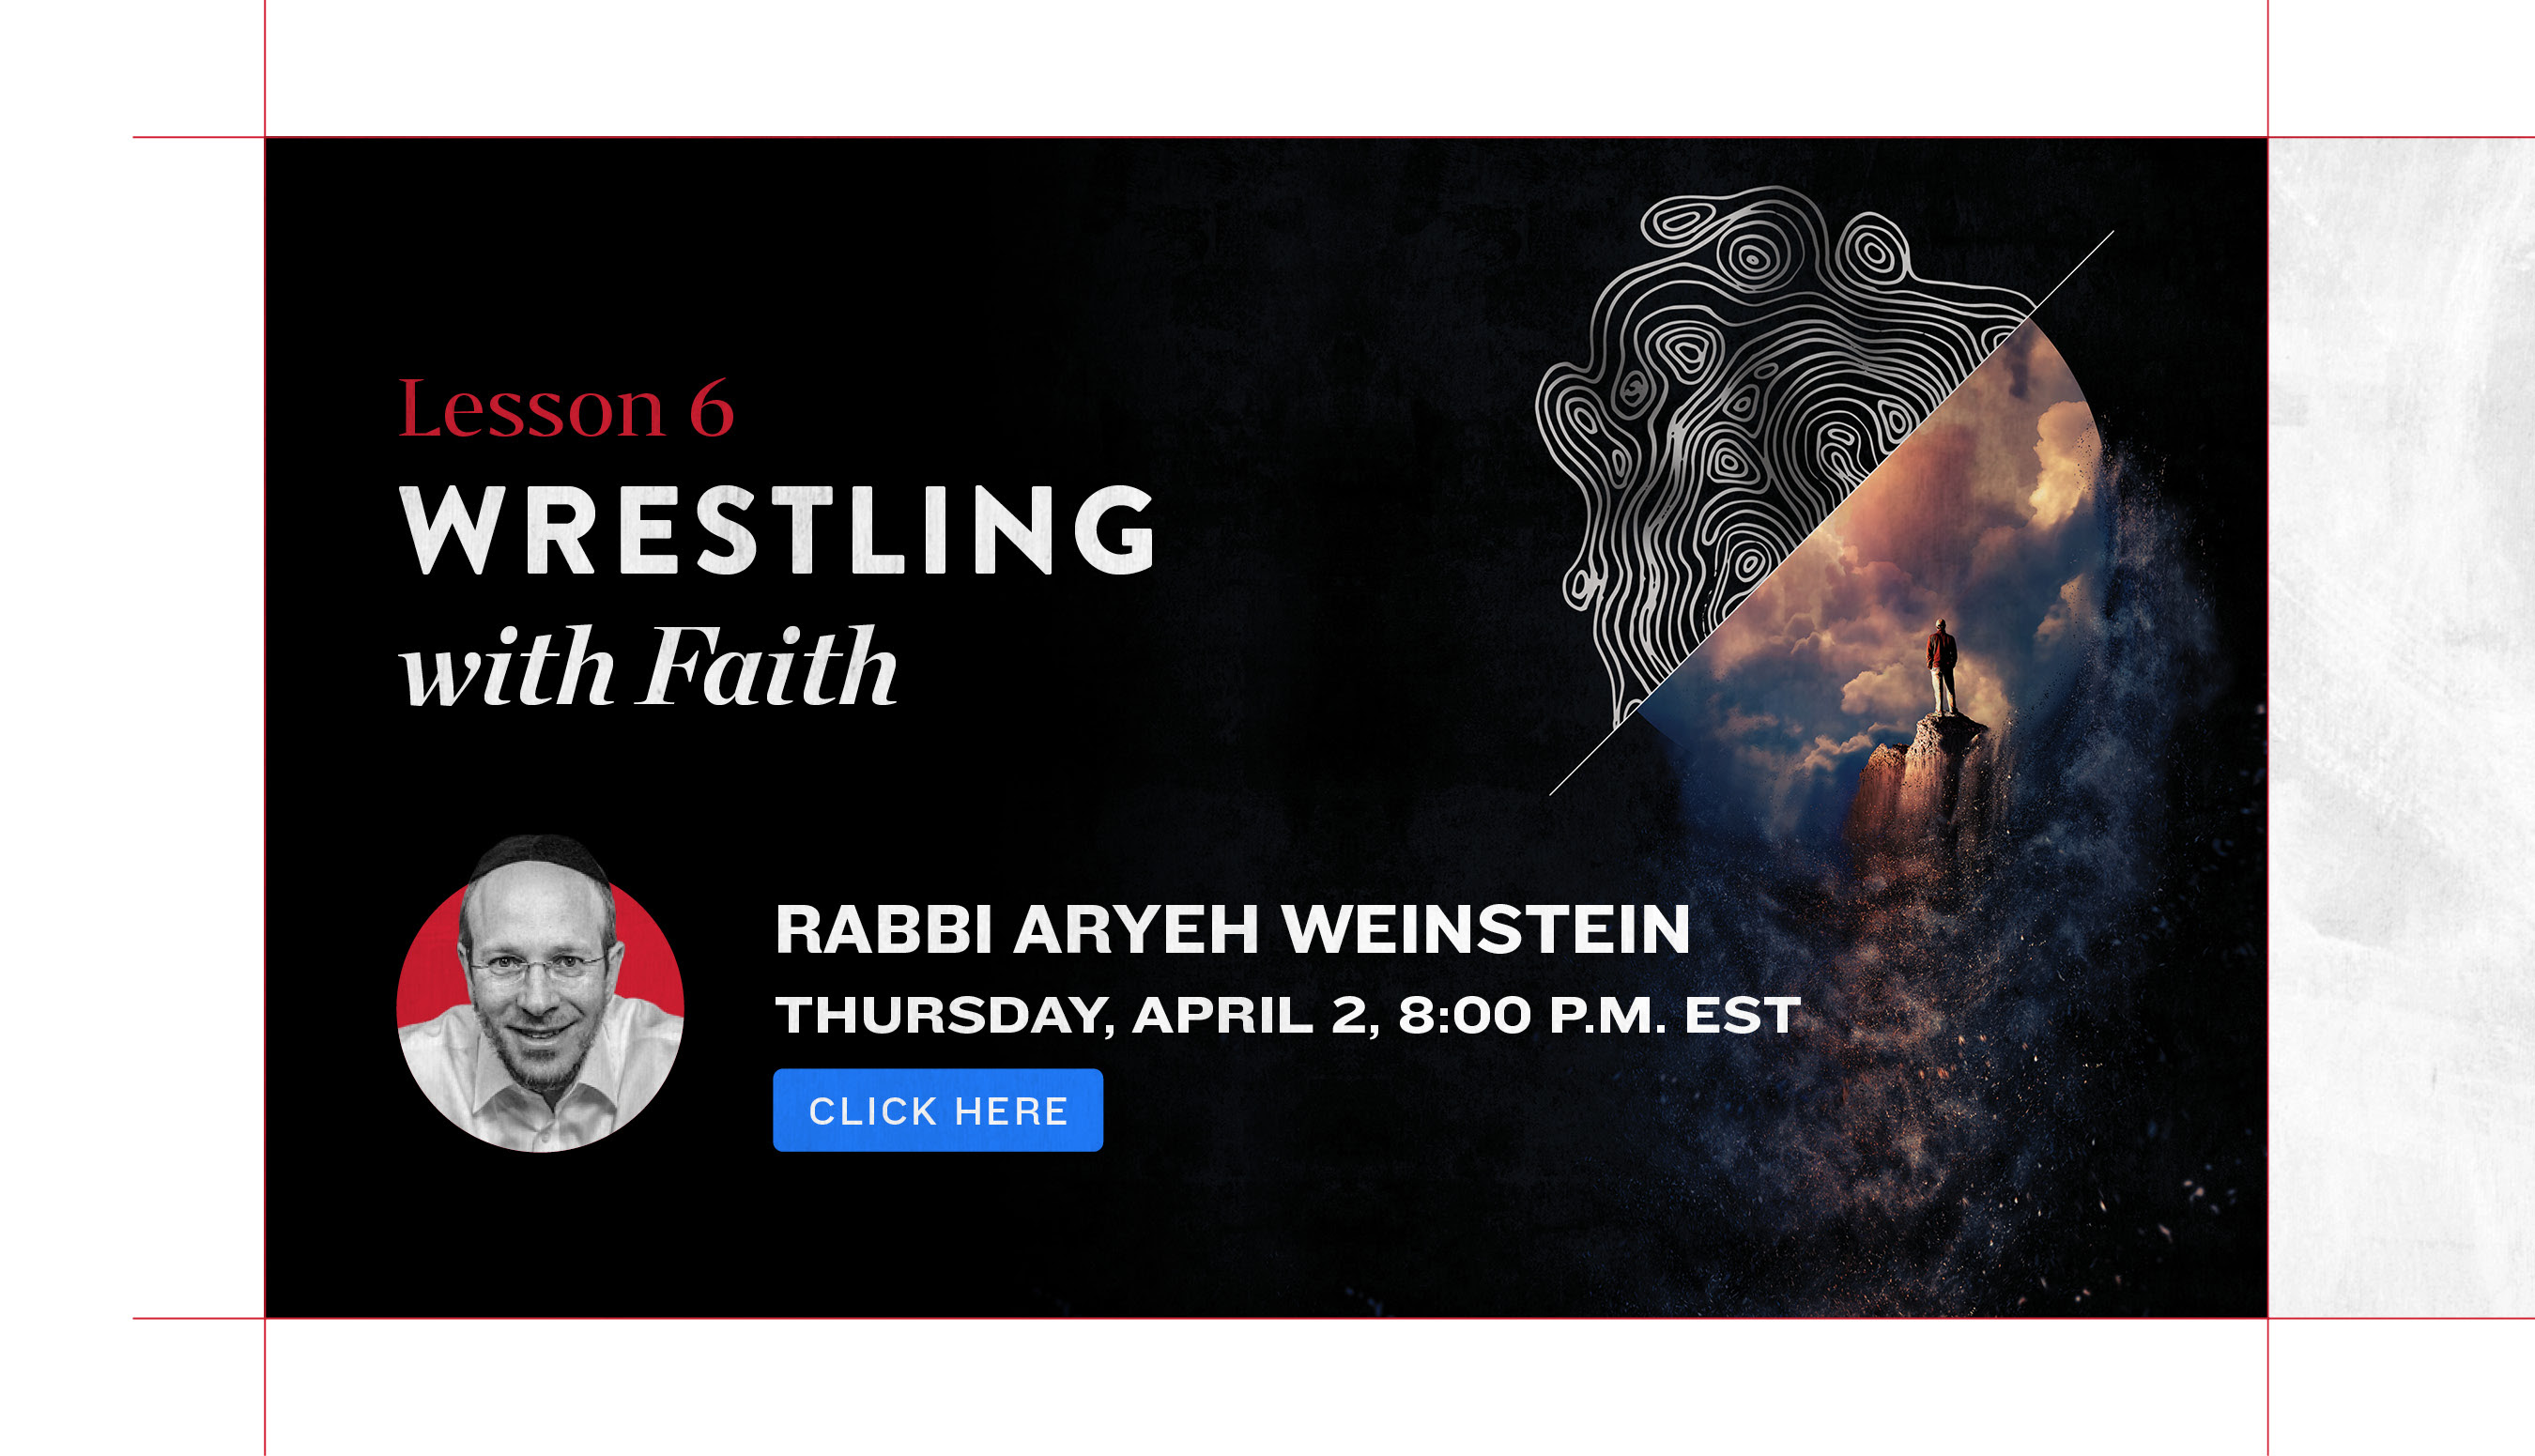 Wrestling with Faith Lesson 6. Rabbi Aryeh Weinstein